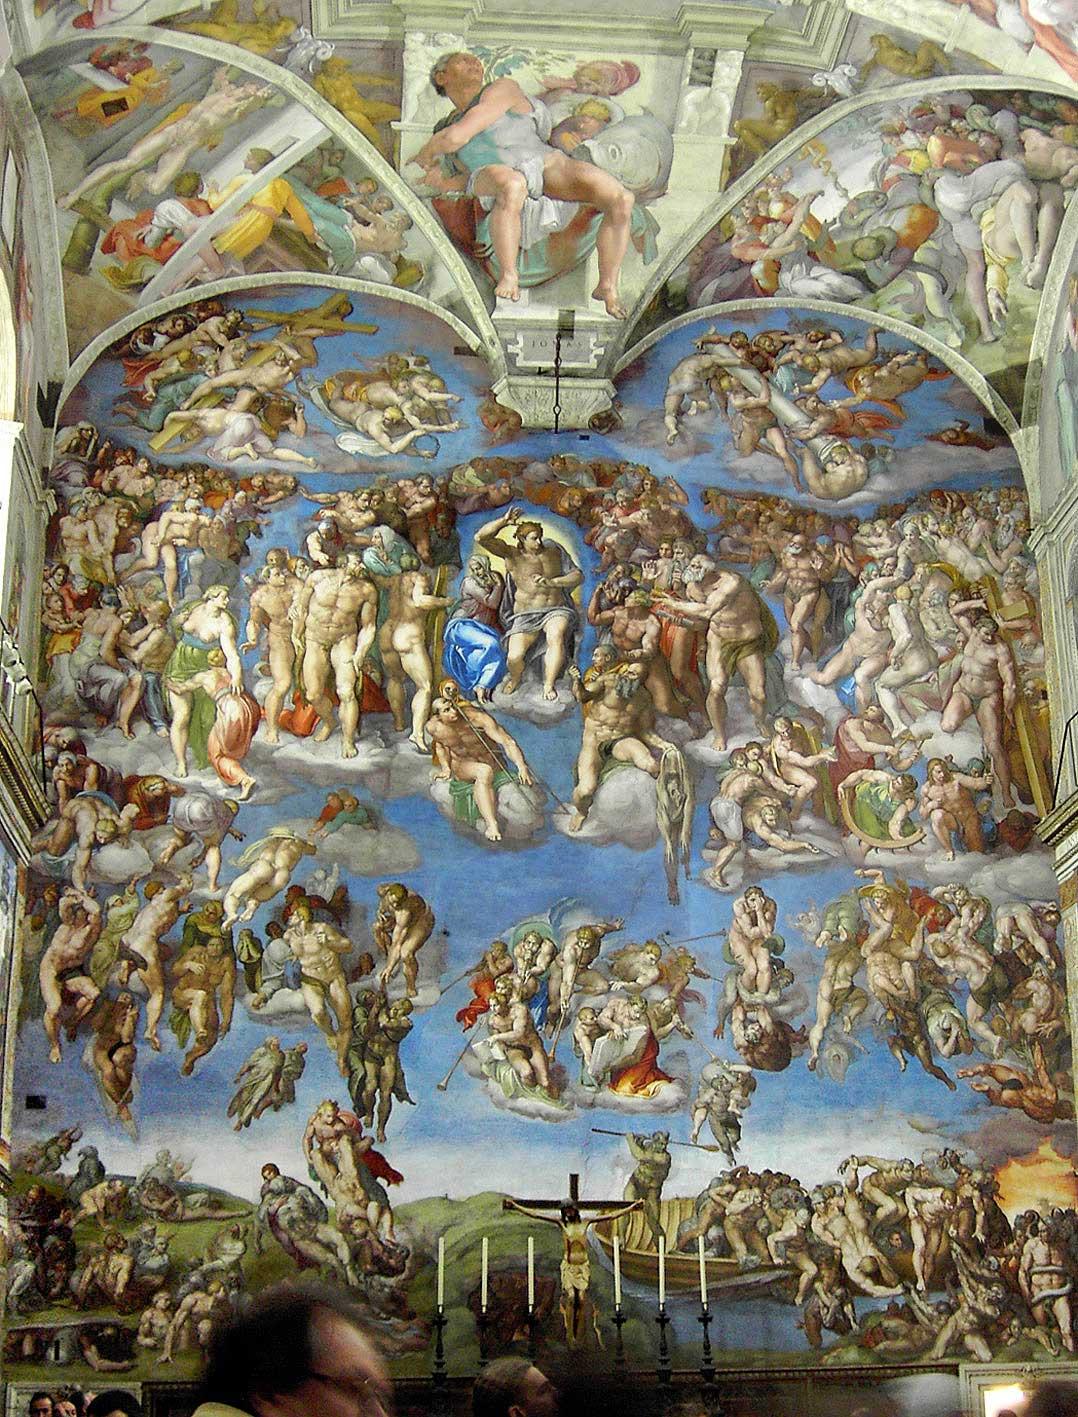 микеланджело страшный суд, Last judgement